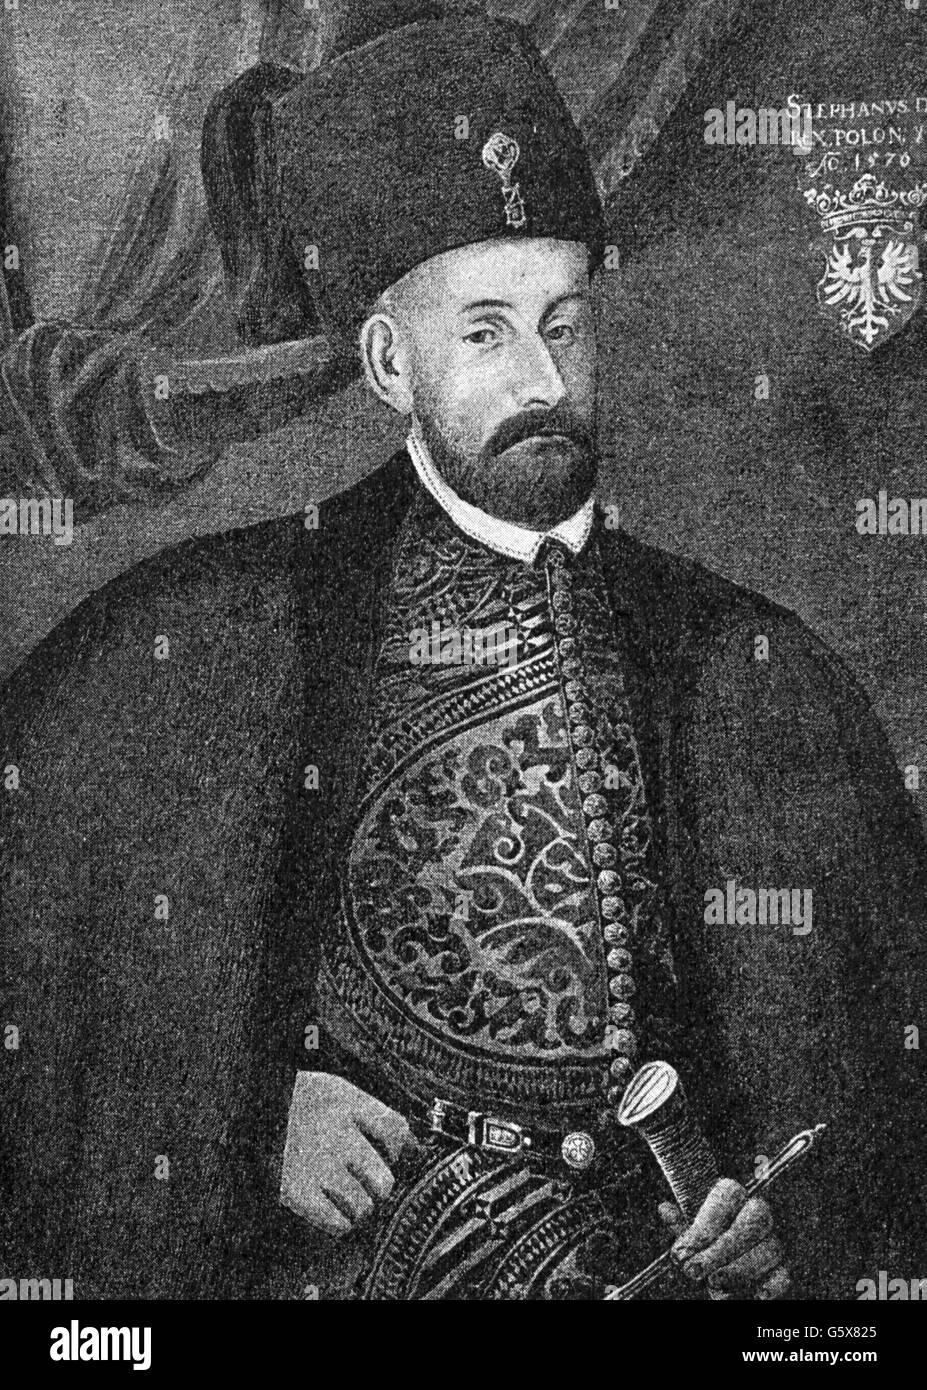 Stephen Bathory, 27.9.1533 - 12.12.1586, King of Poland 14.12.1575 - 12.12.1586, half length, wood engraving, 19th - Stock Image